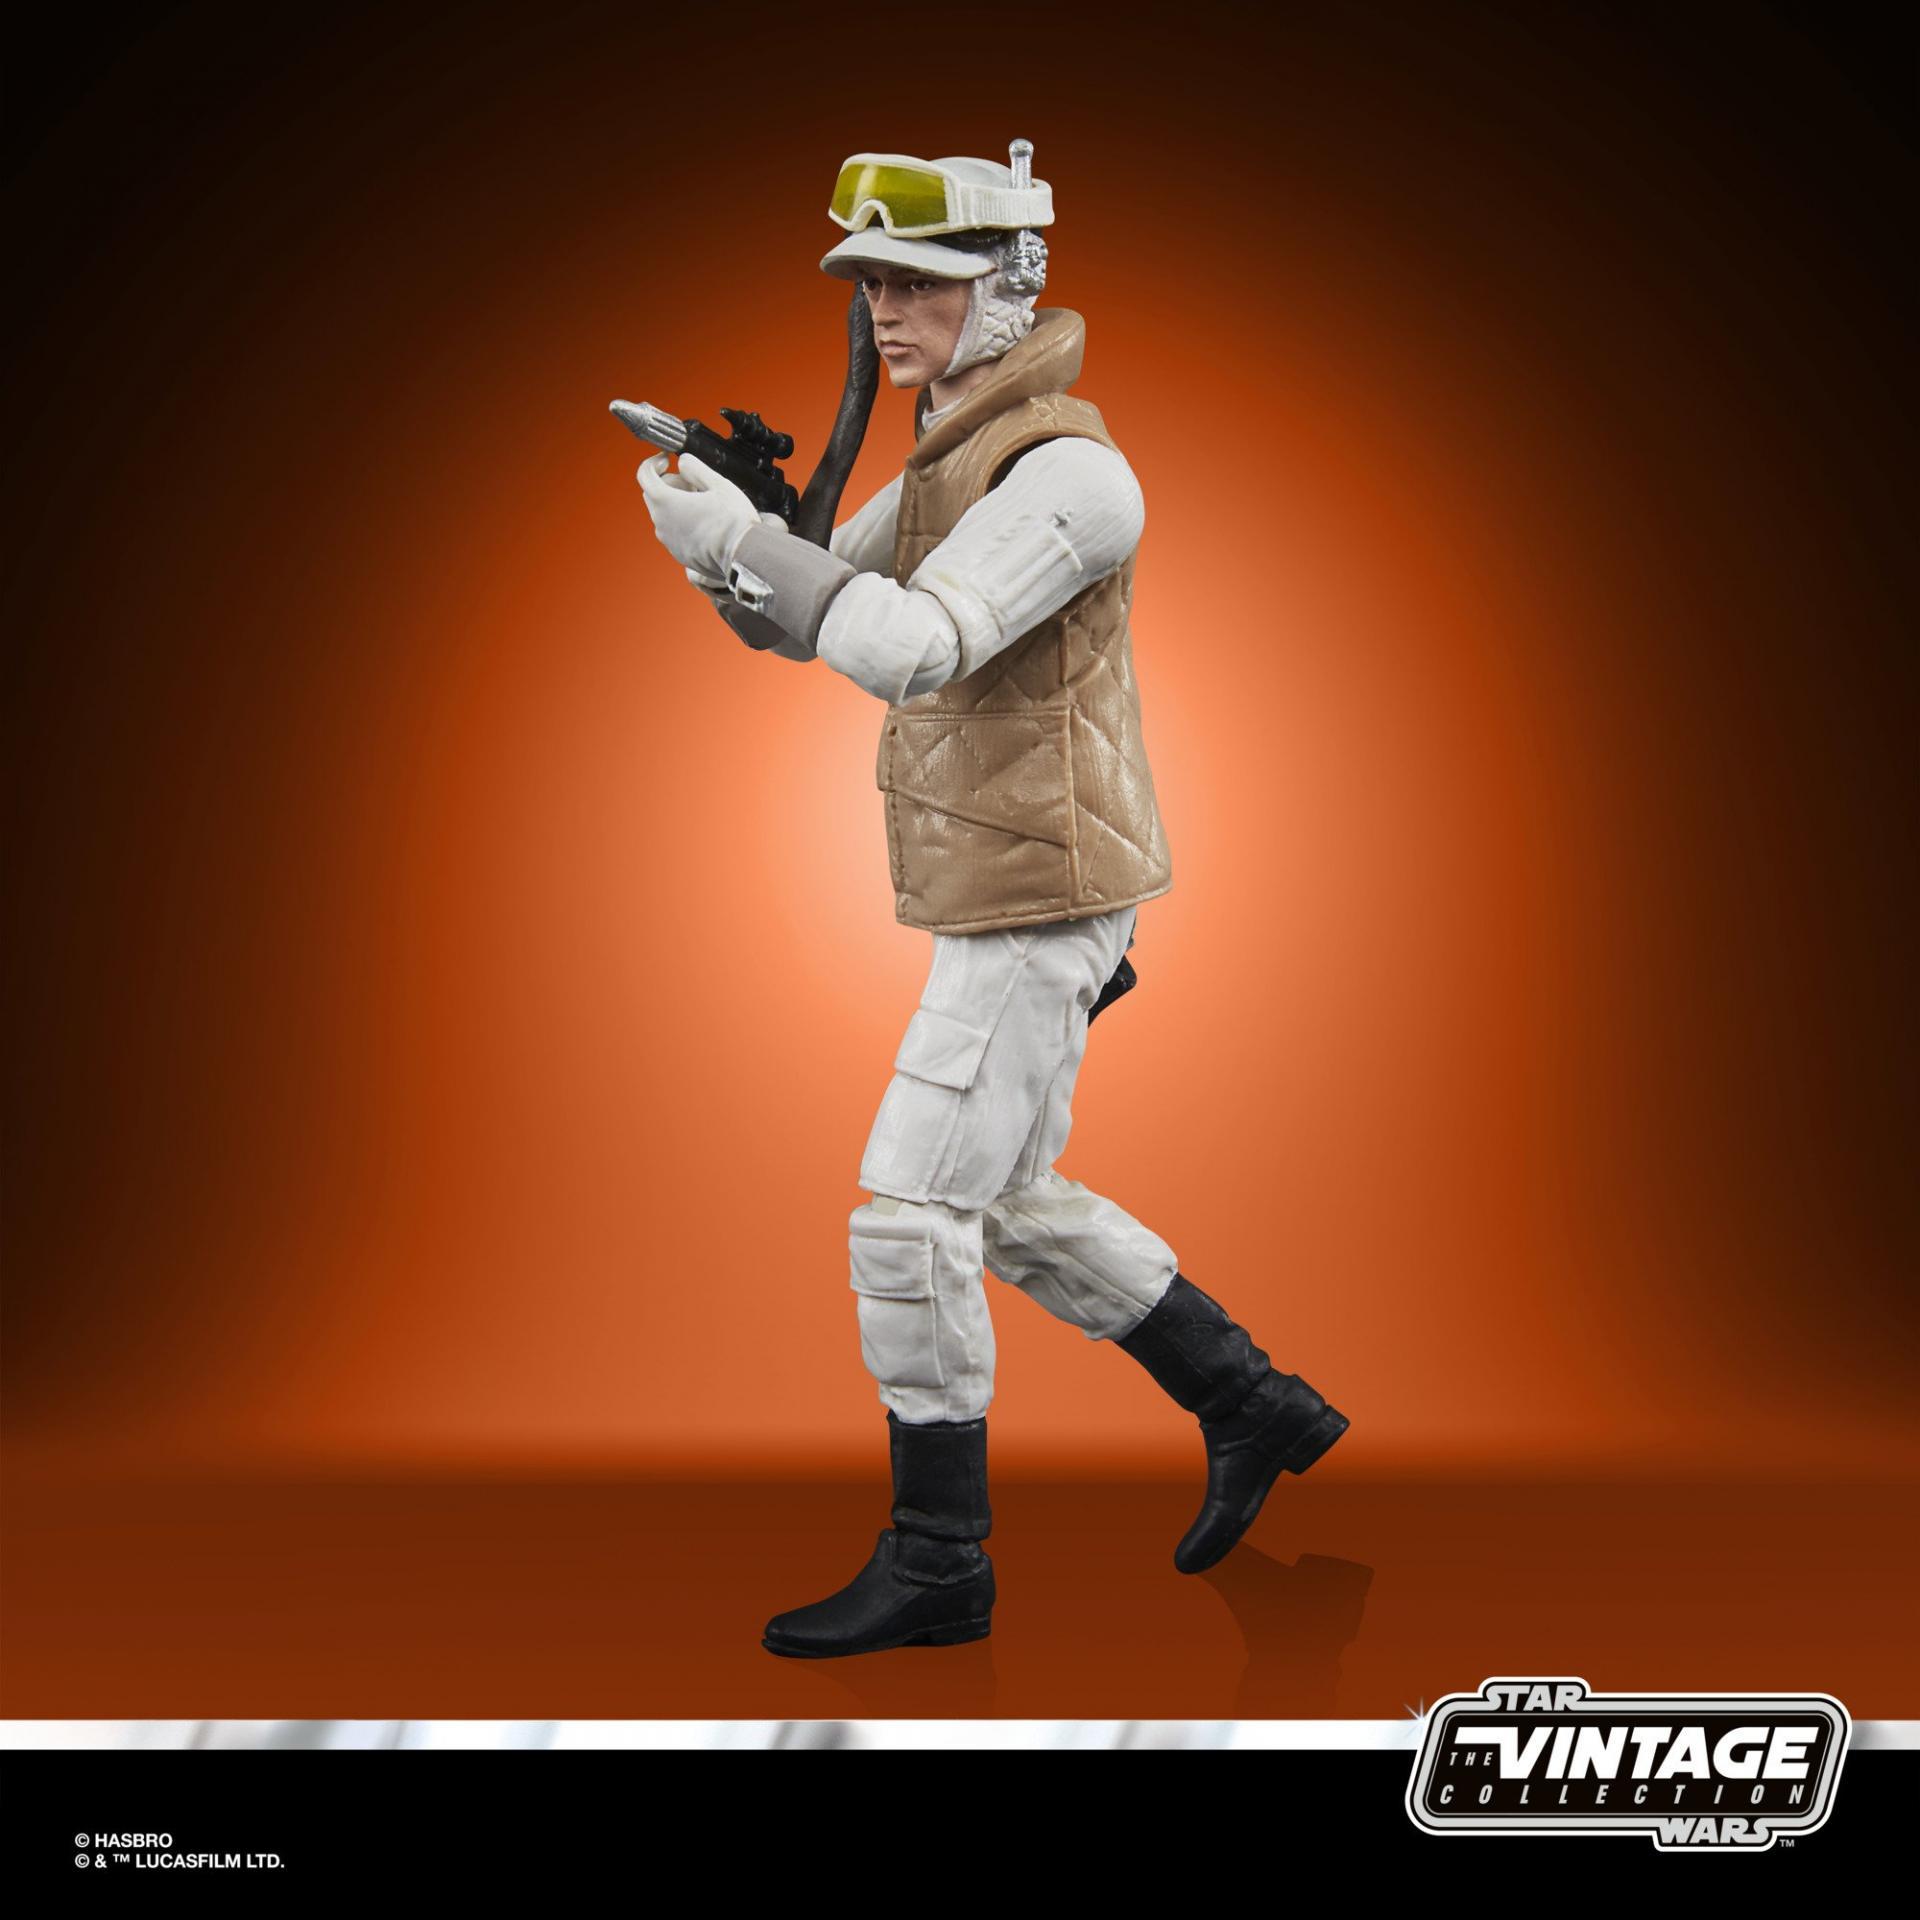 Star wars the vintage collection rebel soldier echo base battle gear 5